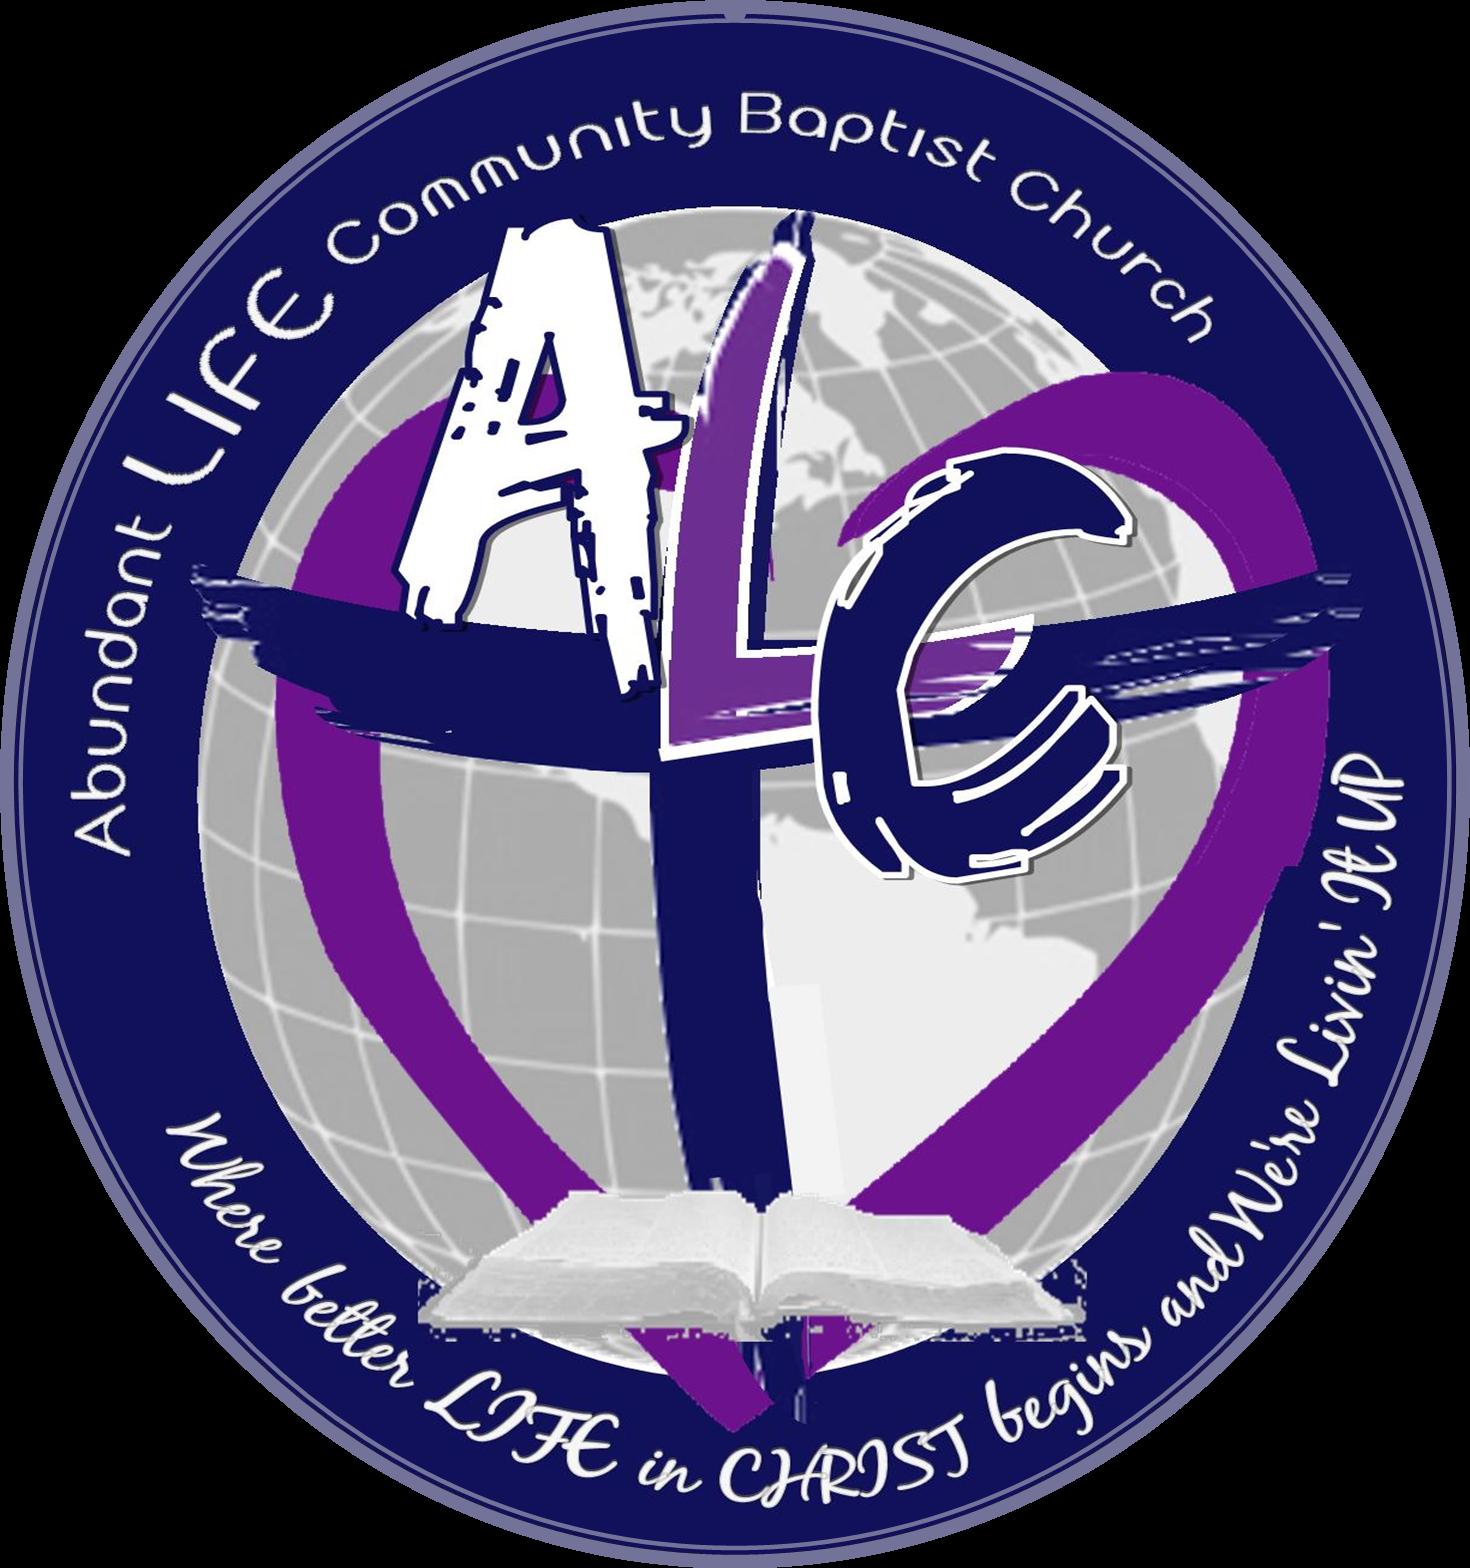 Abundant Life Community Baptist Church